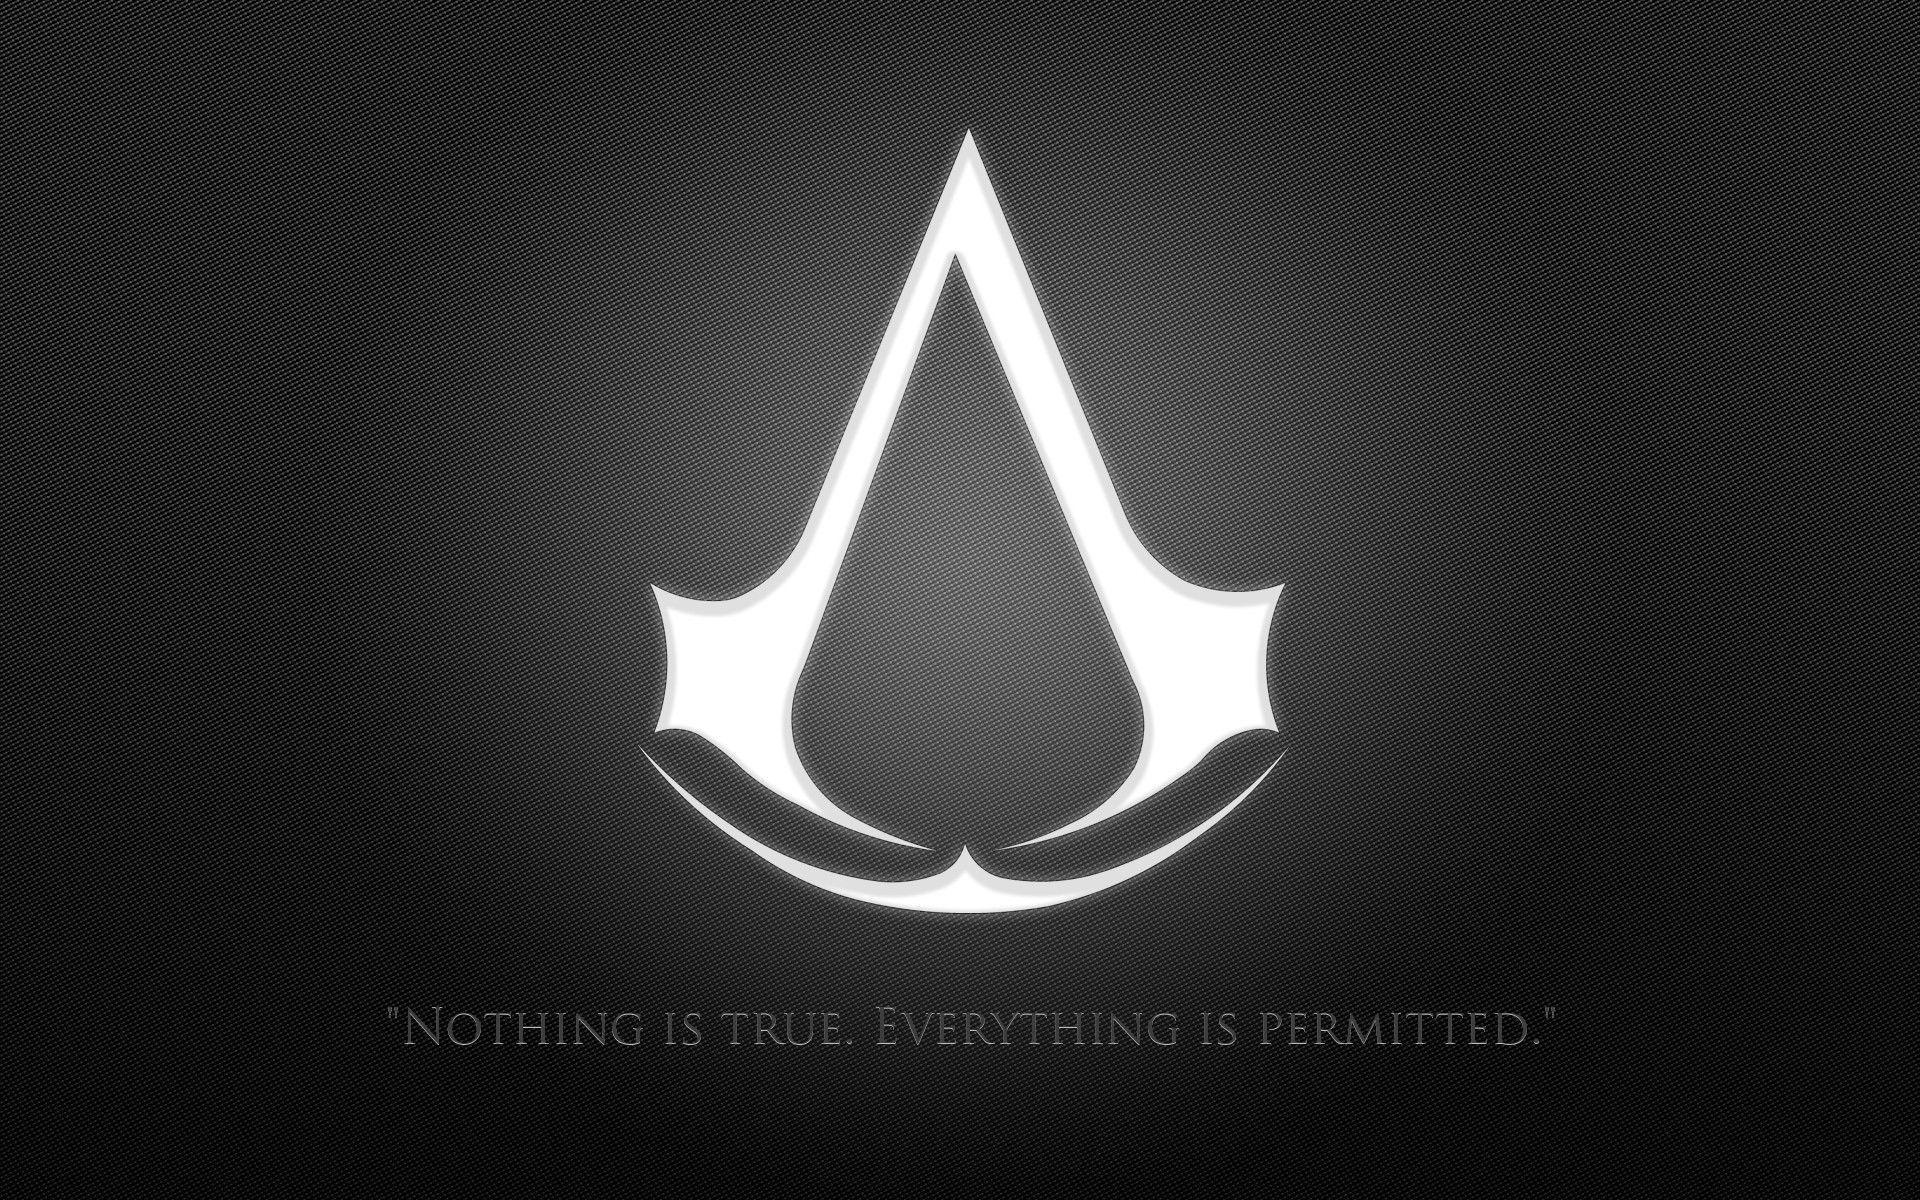 desktop assassins creed symbol - photo #37